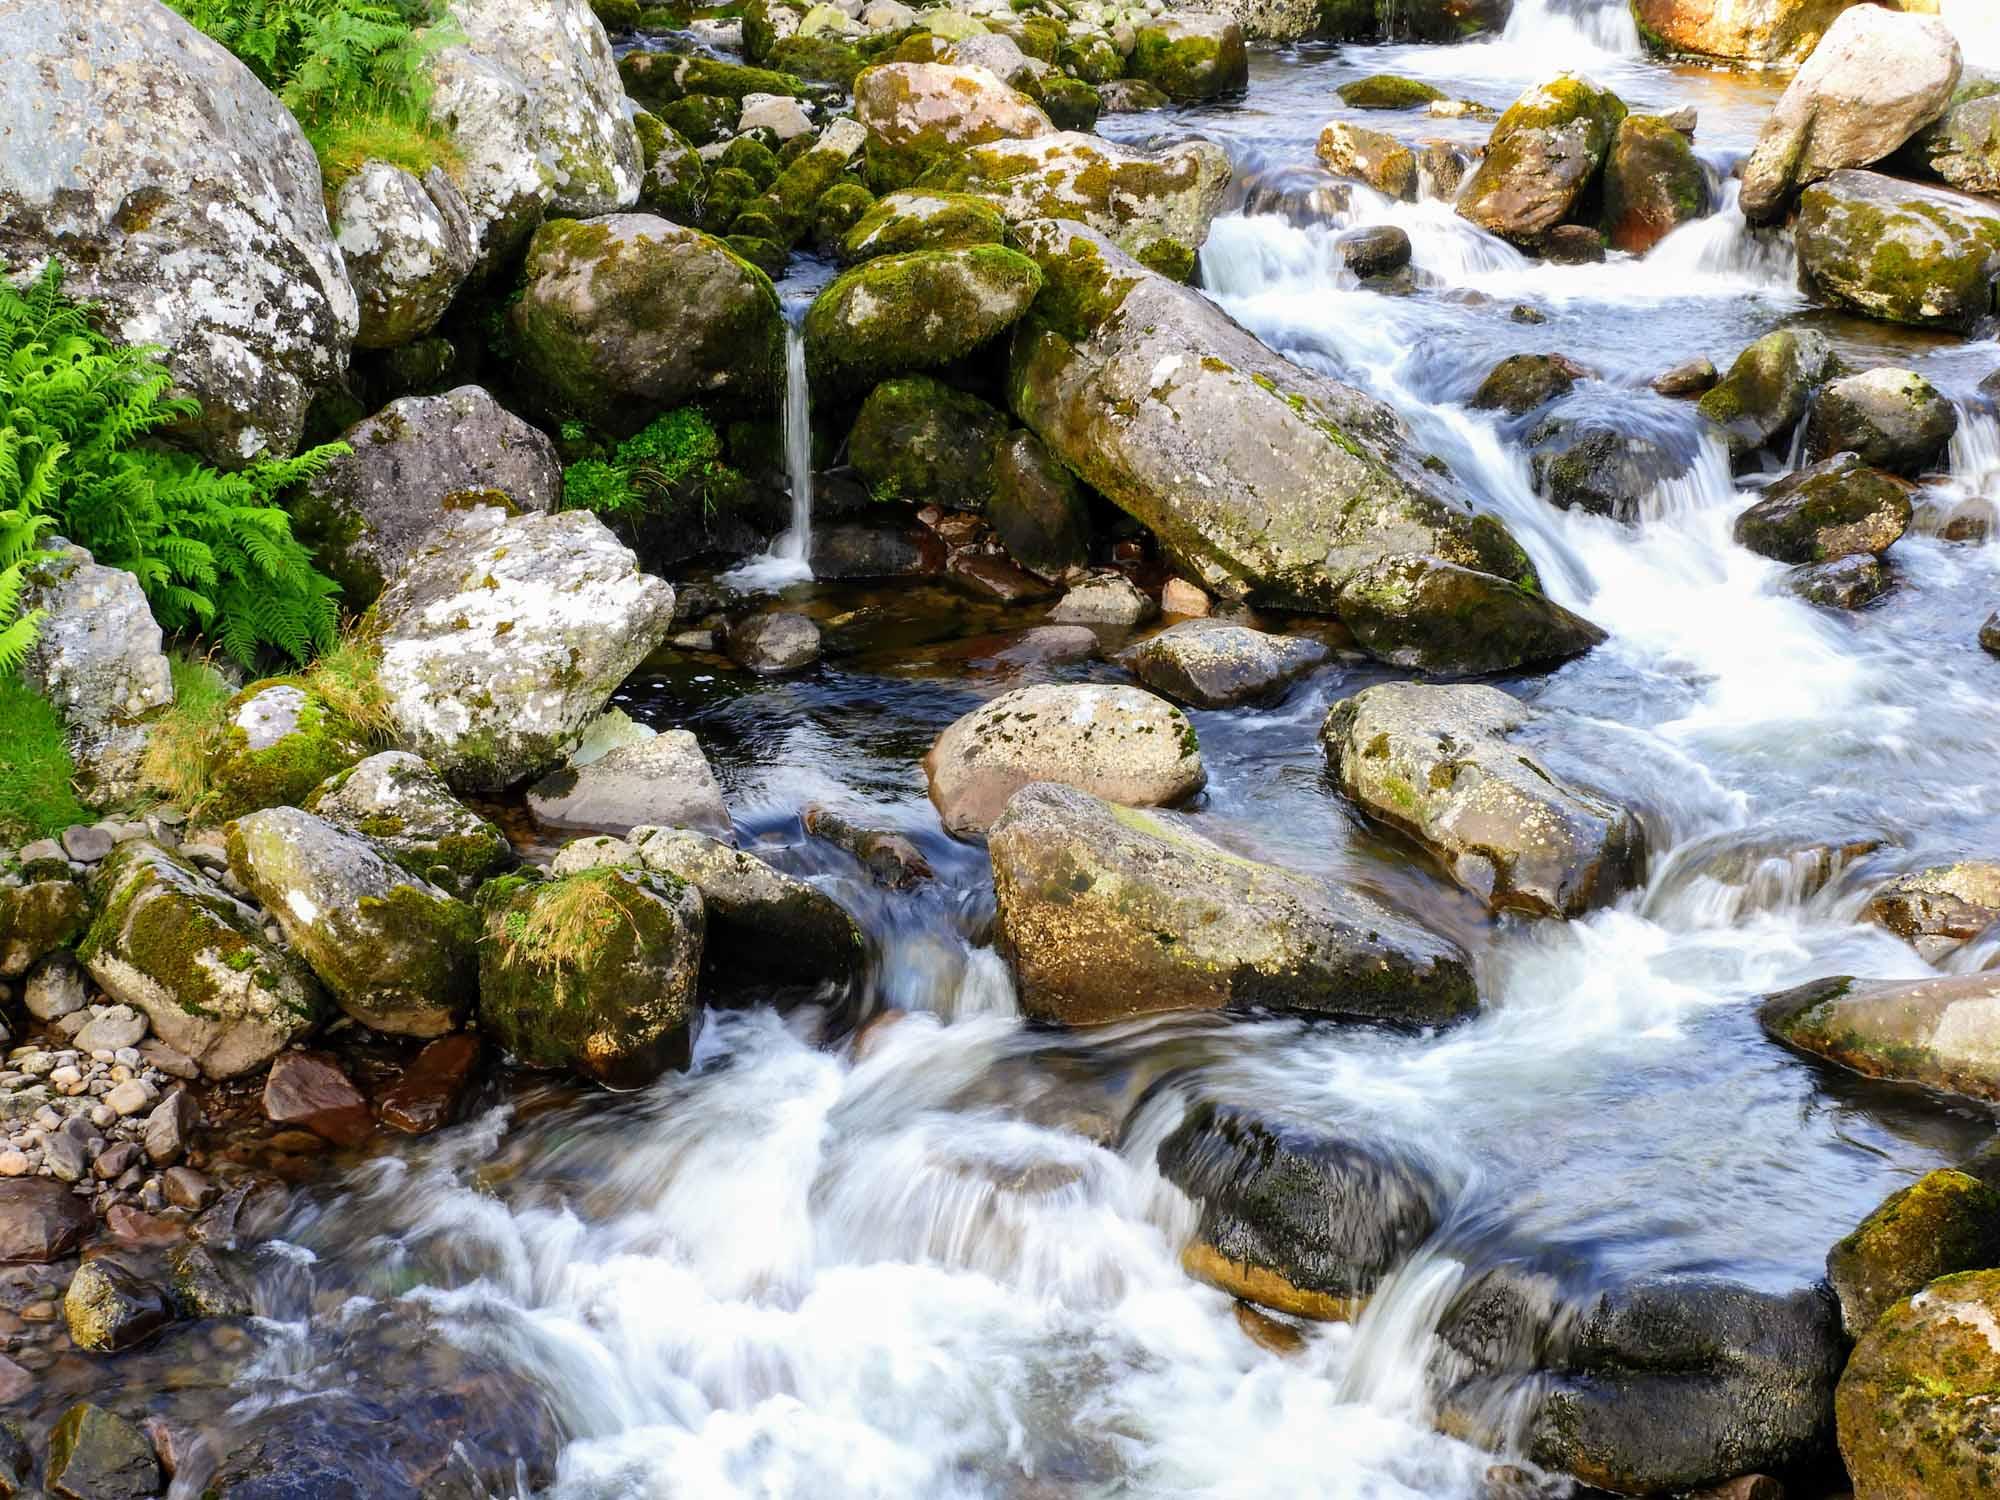 ireland-carrauntoohil-highest-mountain-peak-stream-water.jpg